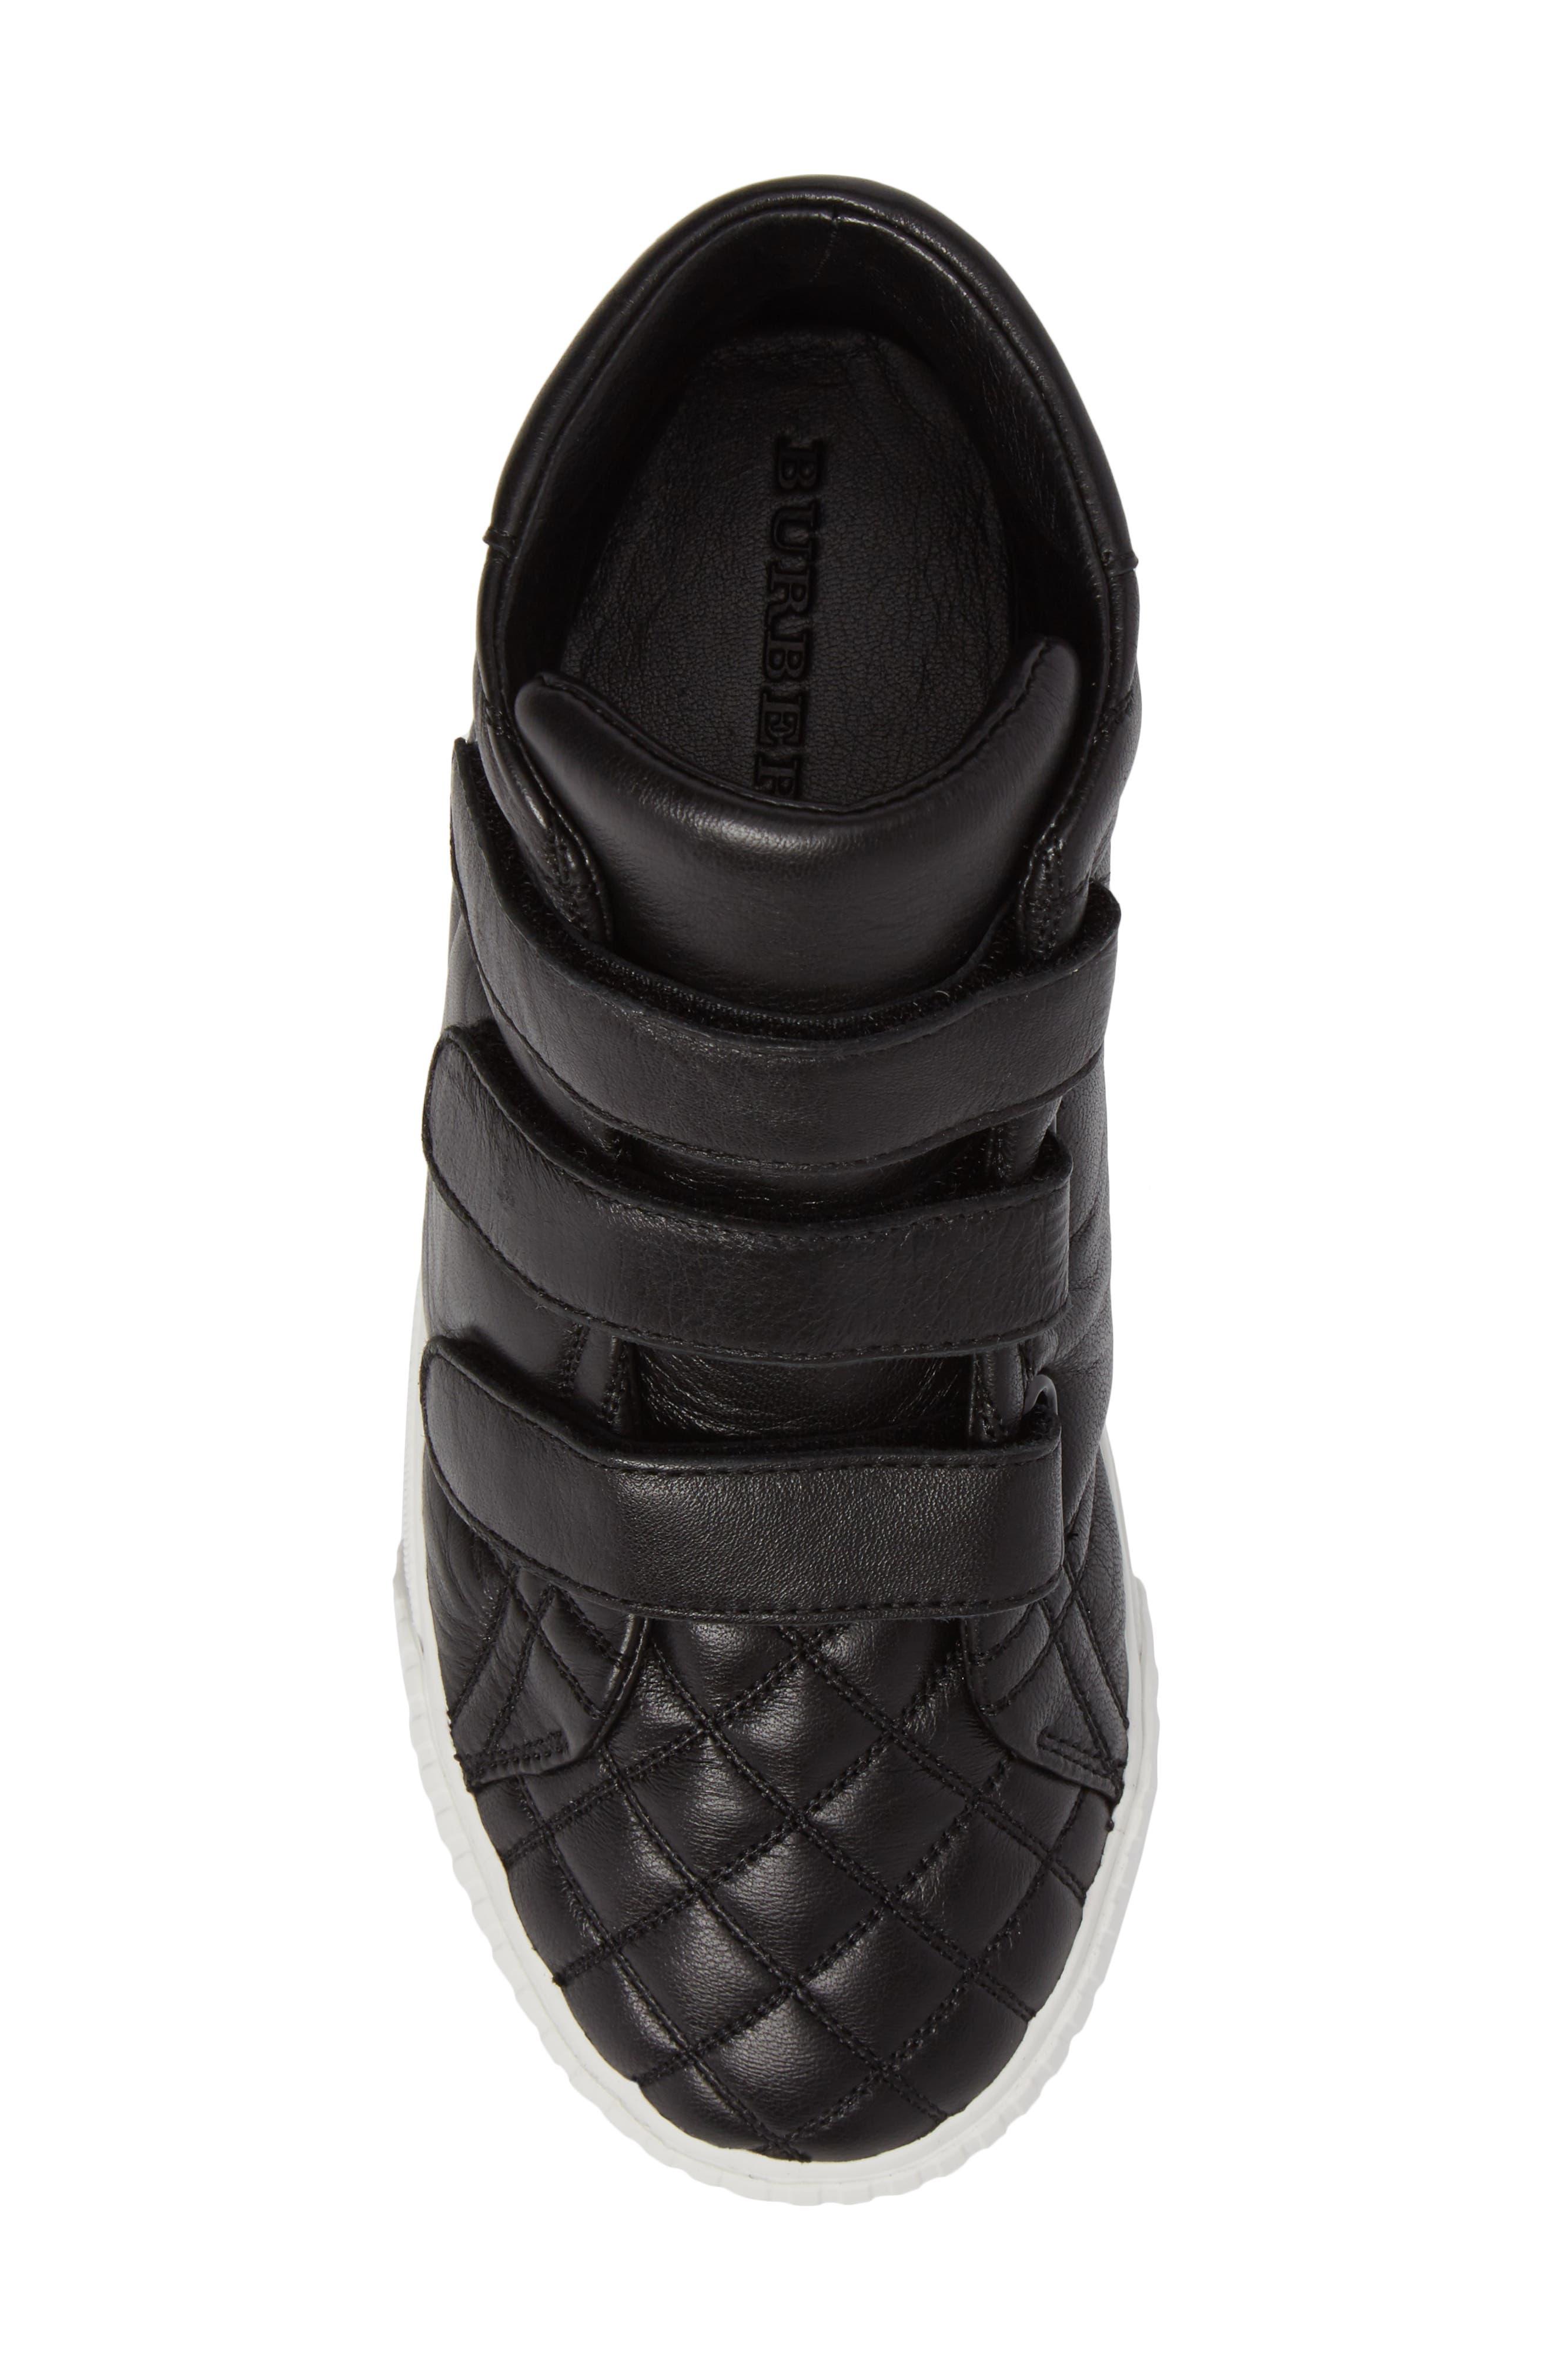 Alternate Image 5  - Burberry Sturrock Quilted High Top Sneaker (Walker, Toddler, Little Kid & Big Kid)